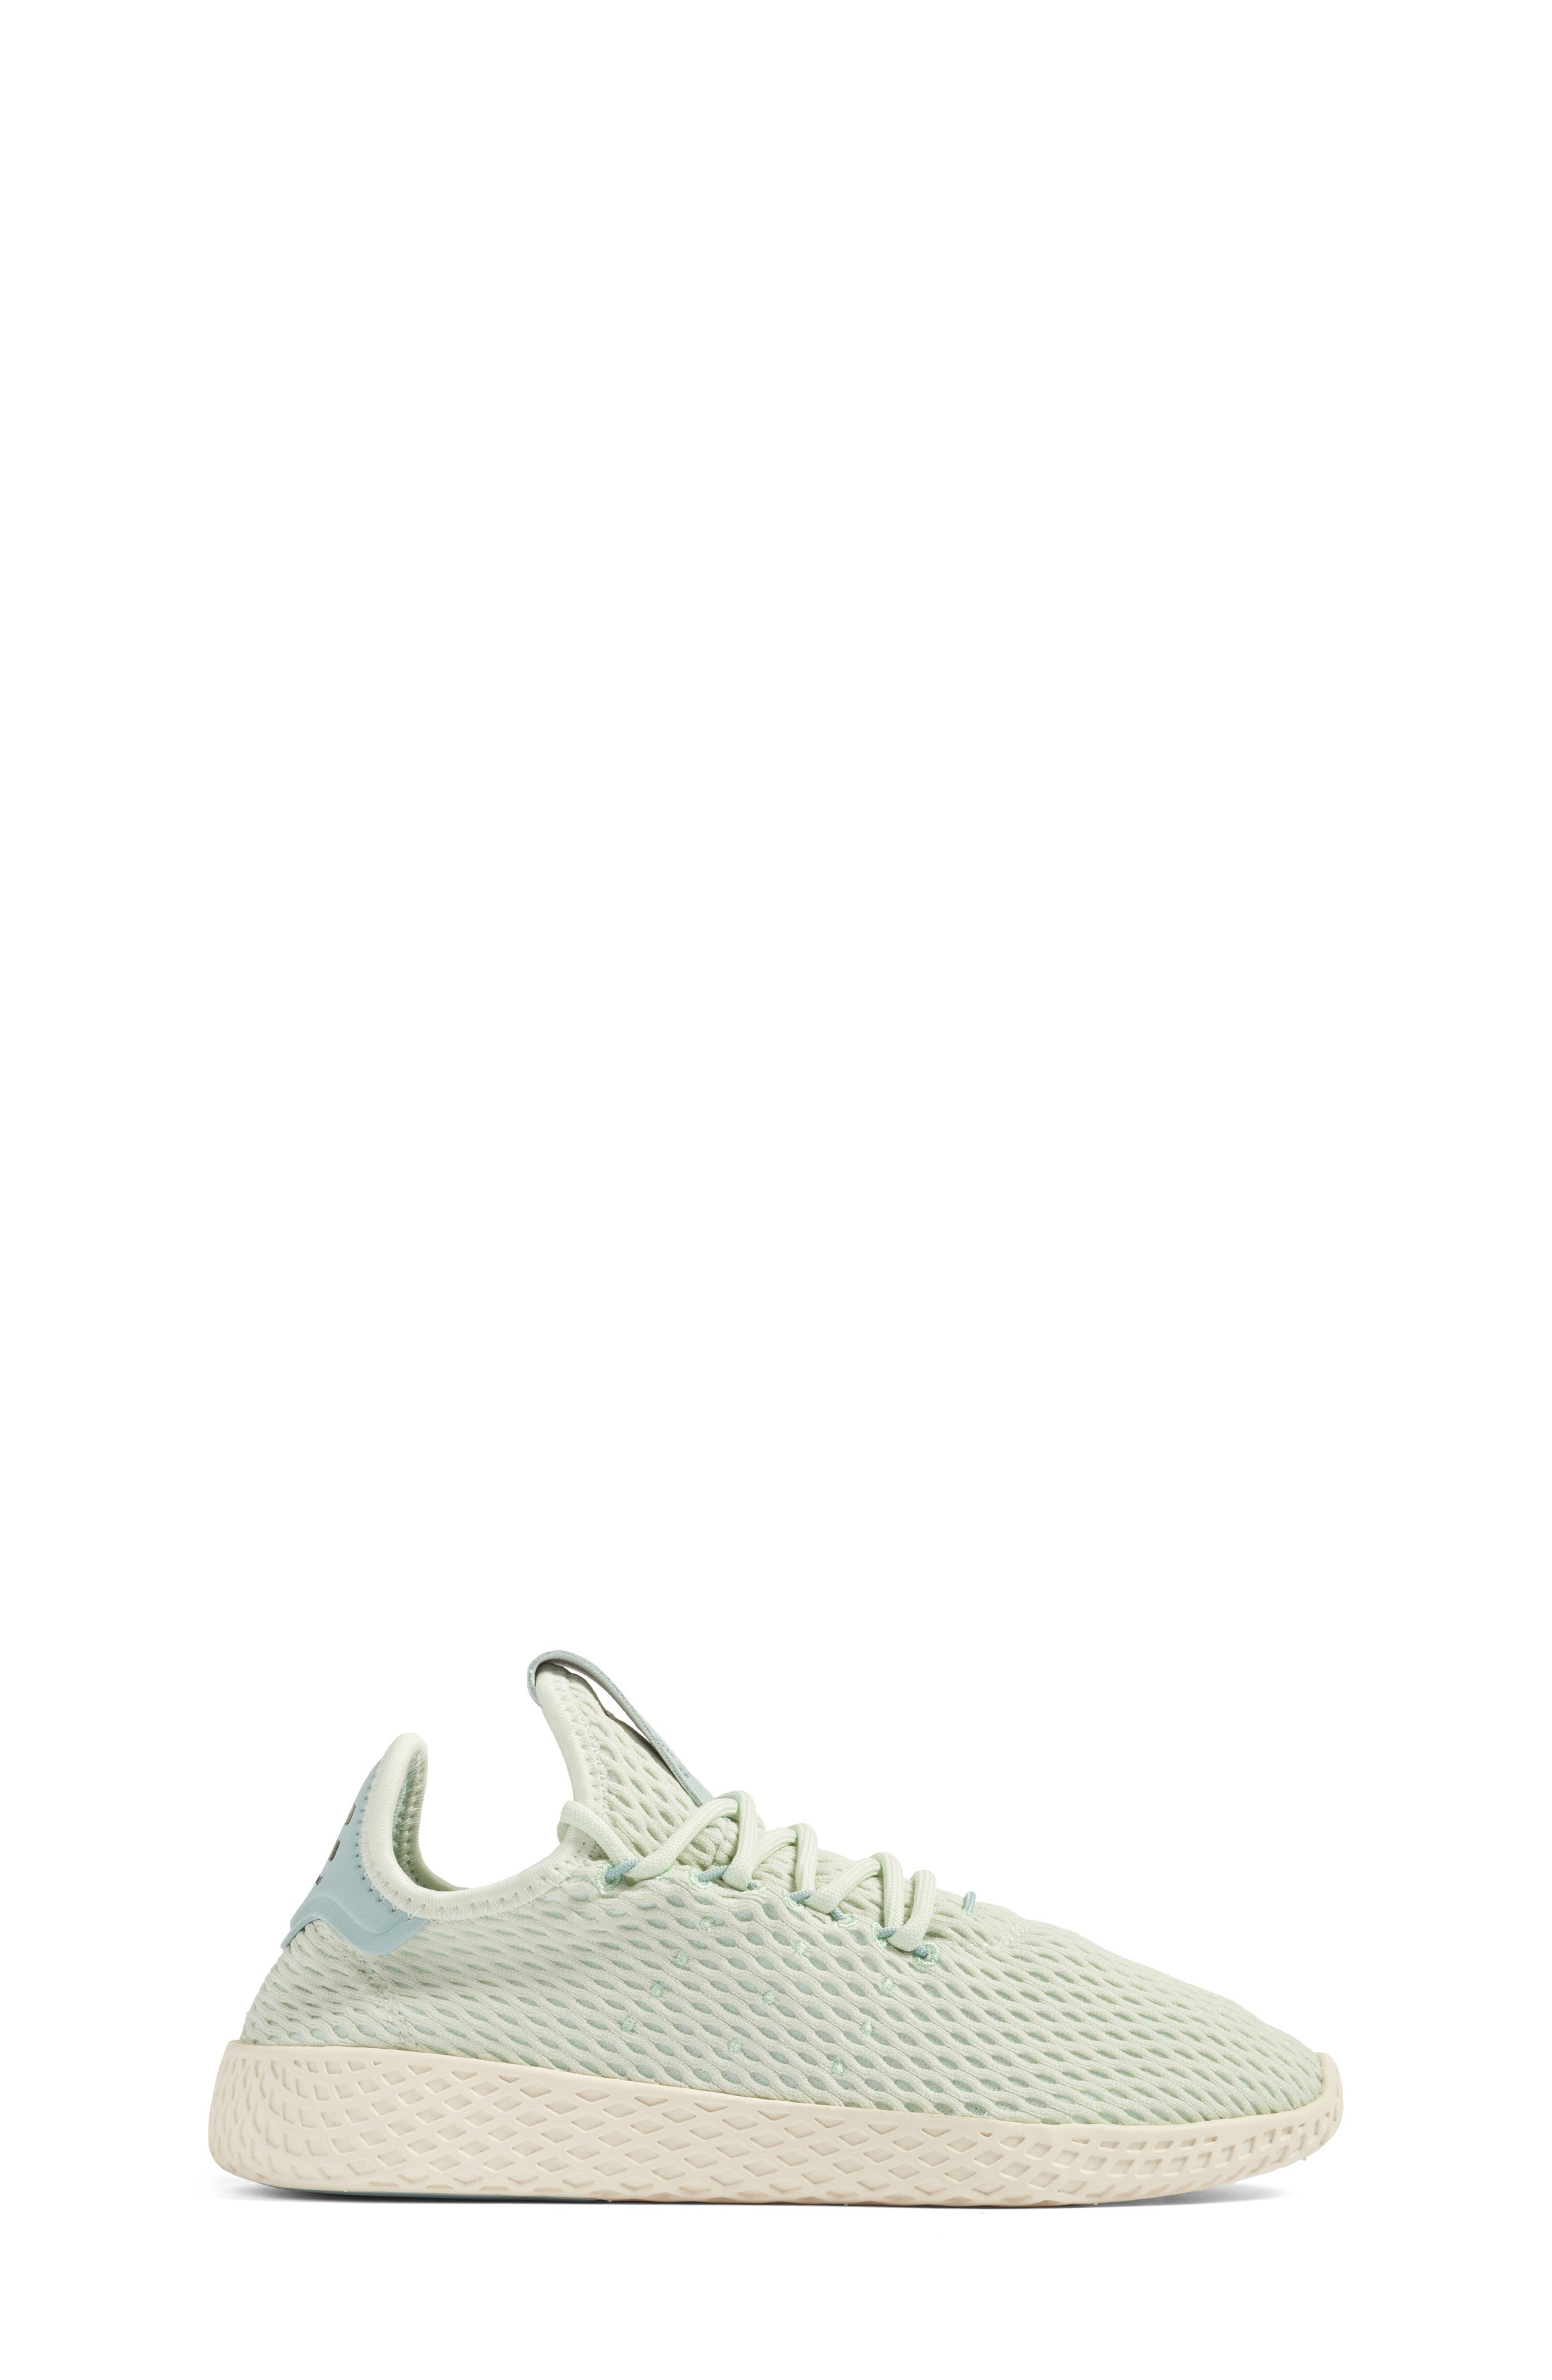 Originals x Pharrell Williams The Summers Mesh Sneaker,                             Alternate thumbnail 3, color,                             334